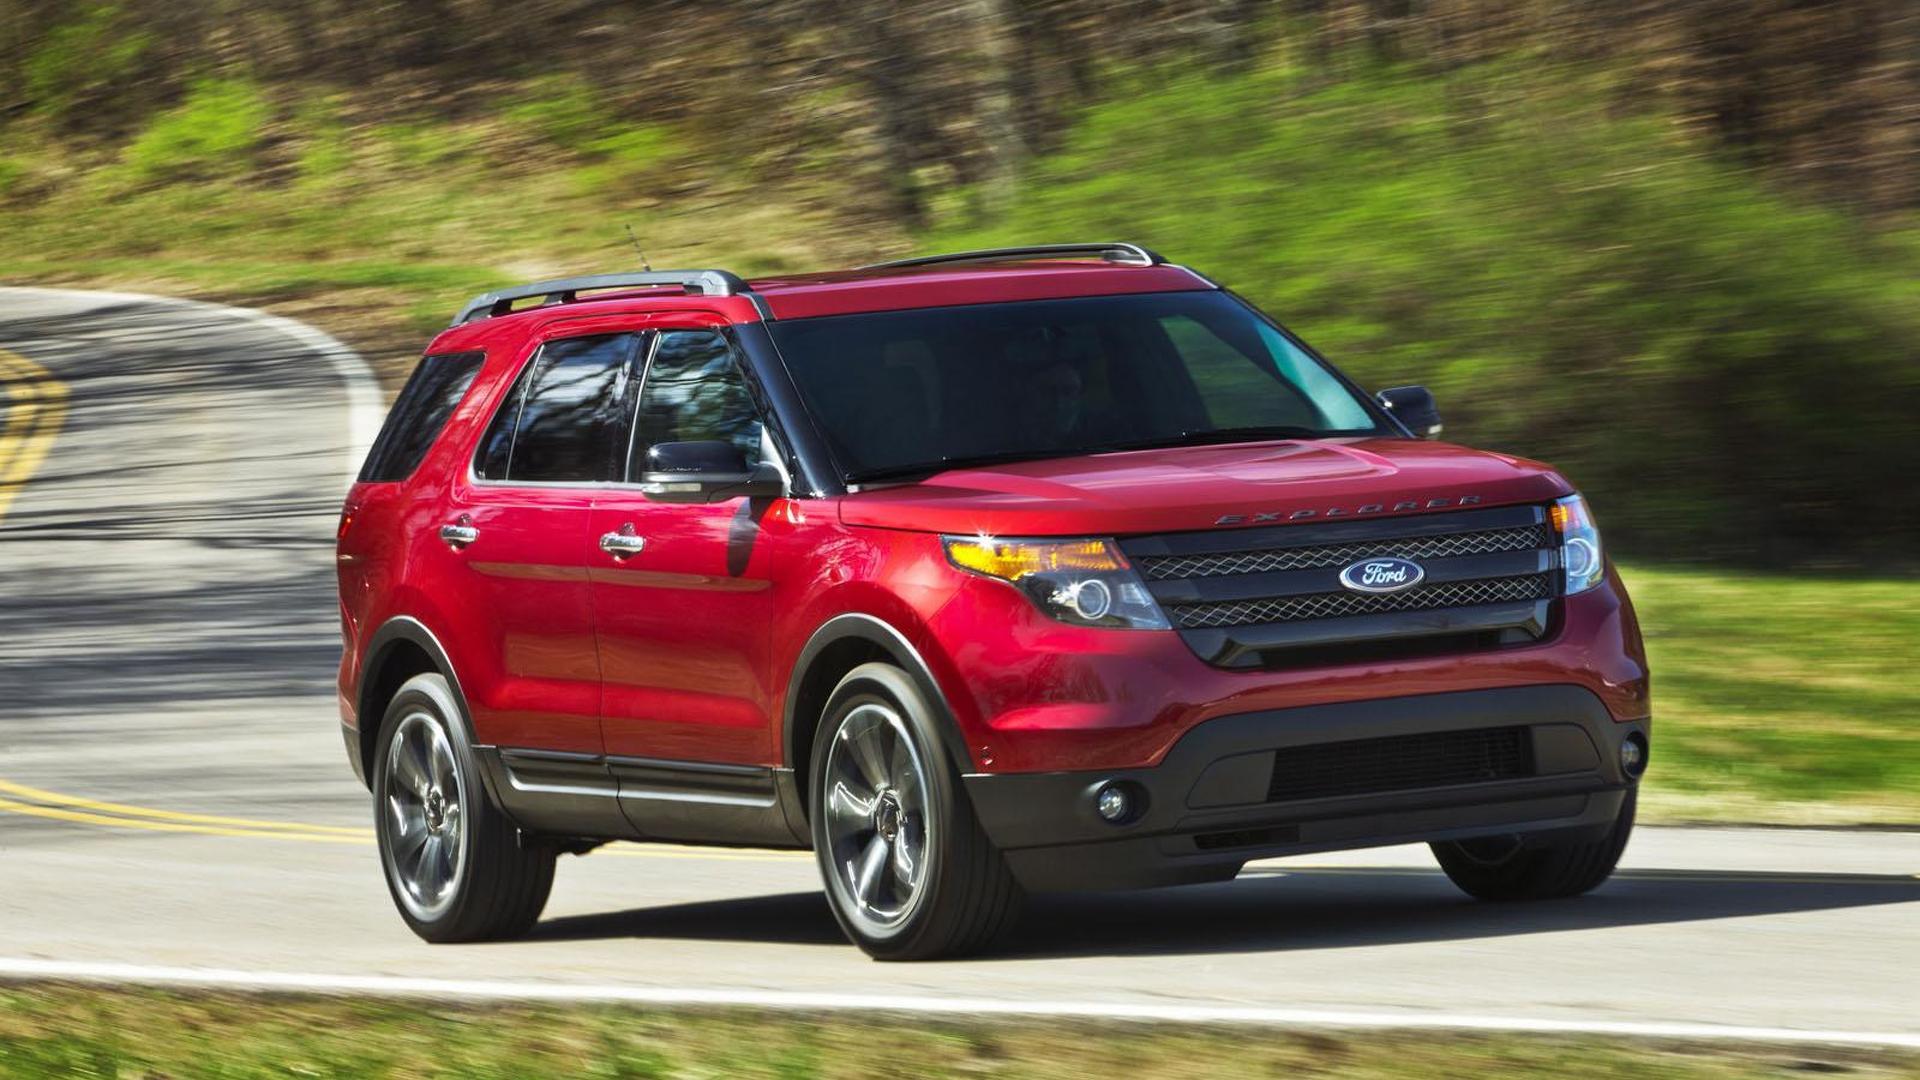 2011 15 Ford Explorer under investigation for exhaust leak